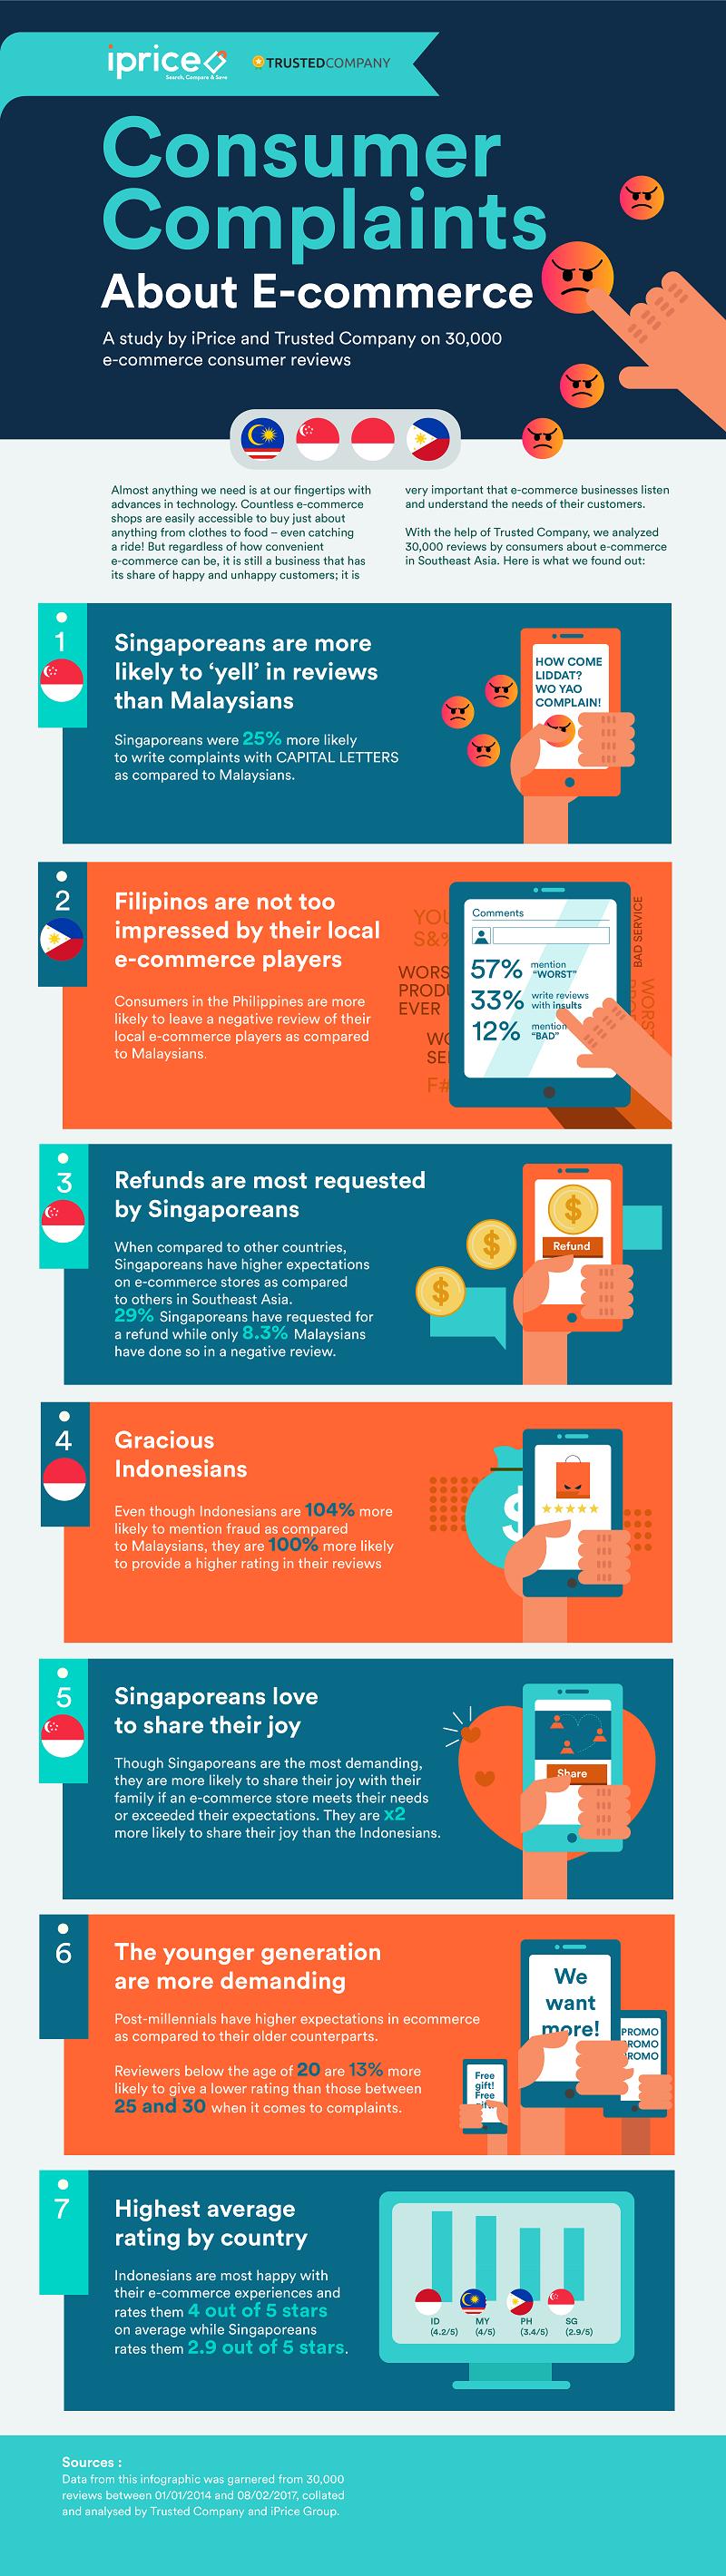 iPrice study consumer complaints